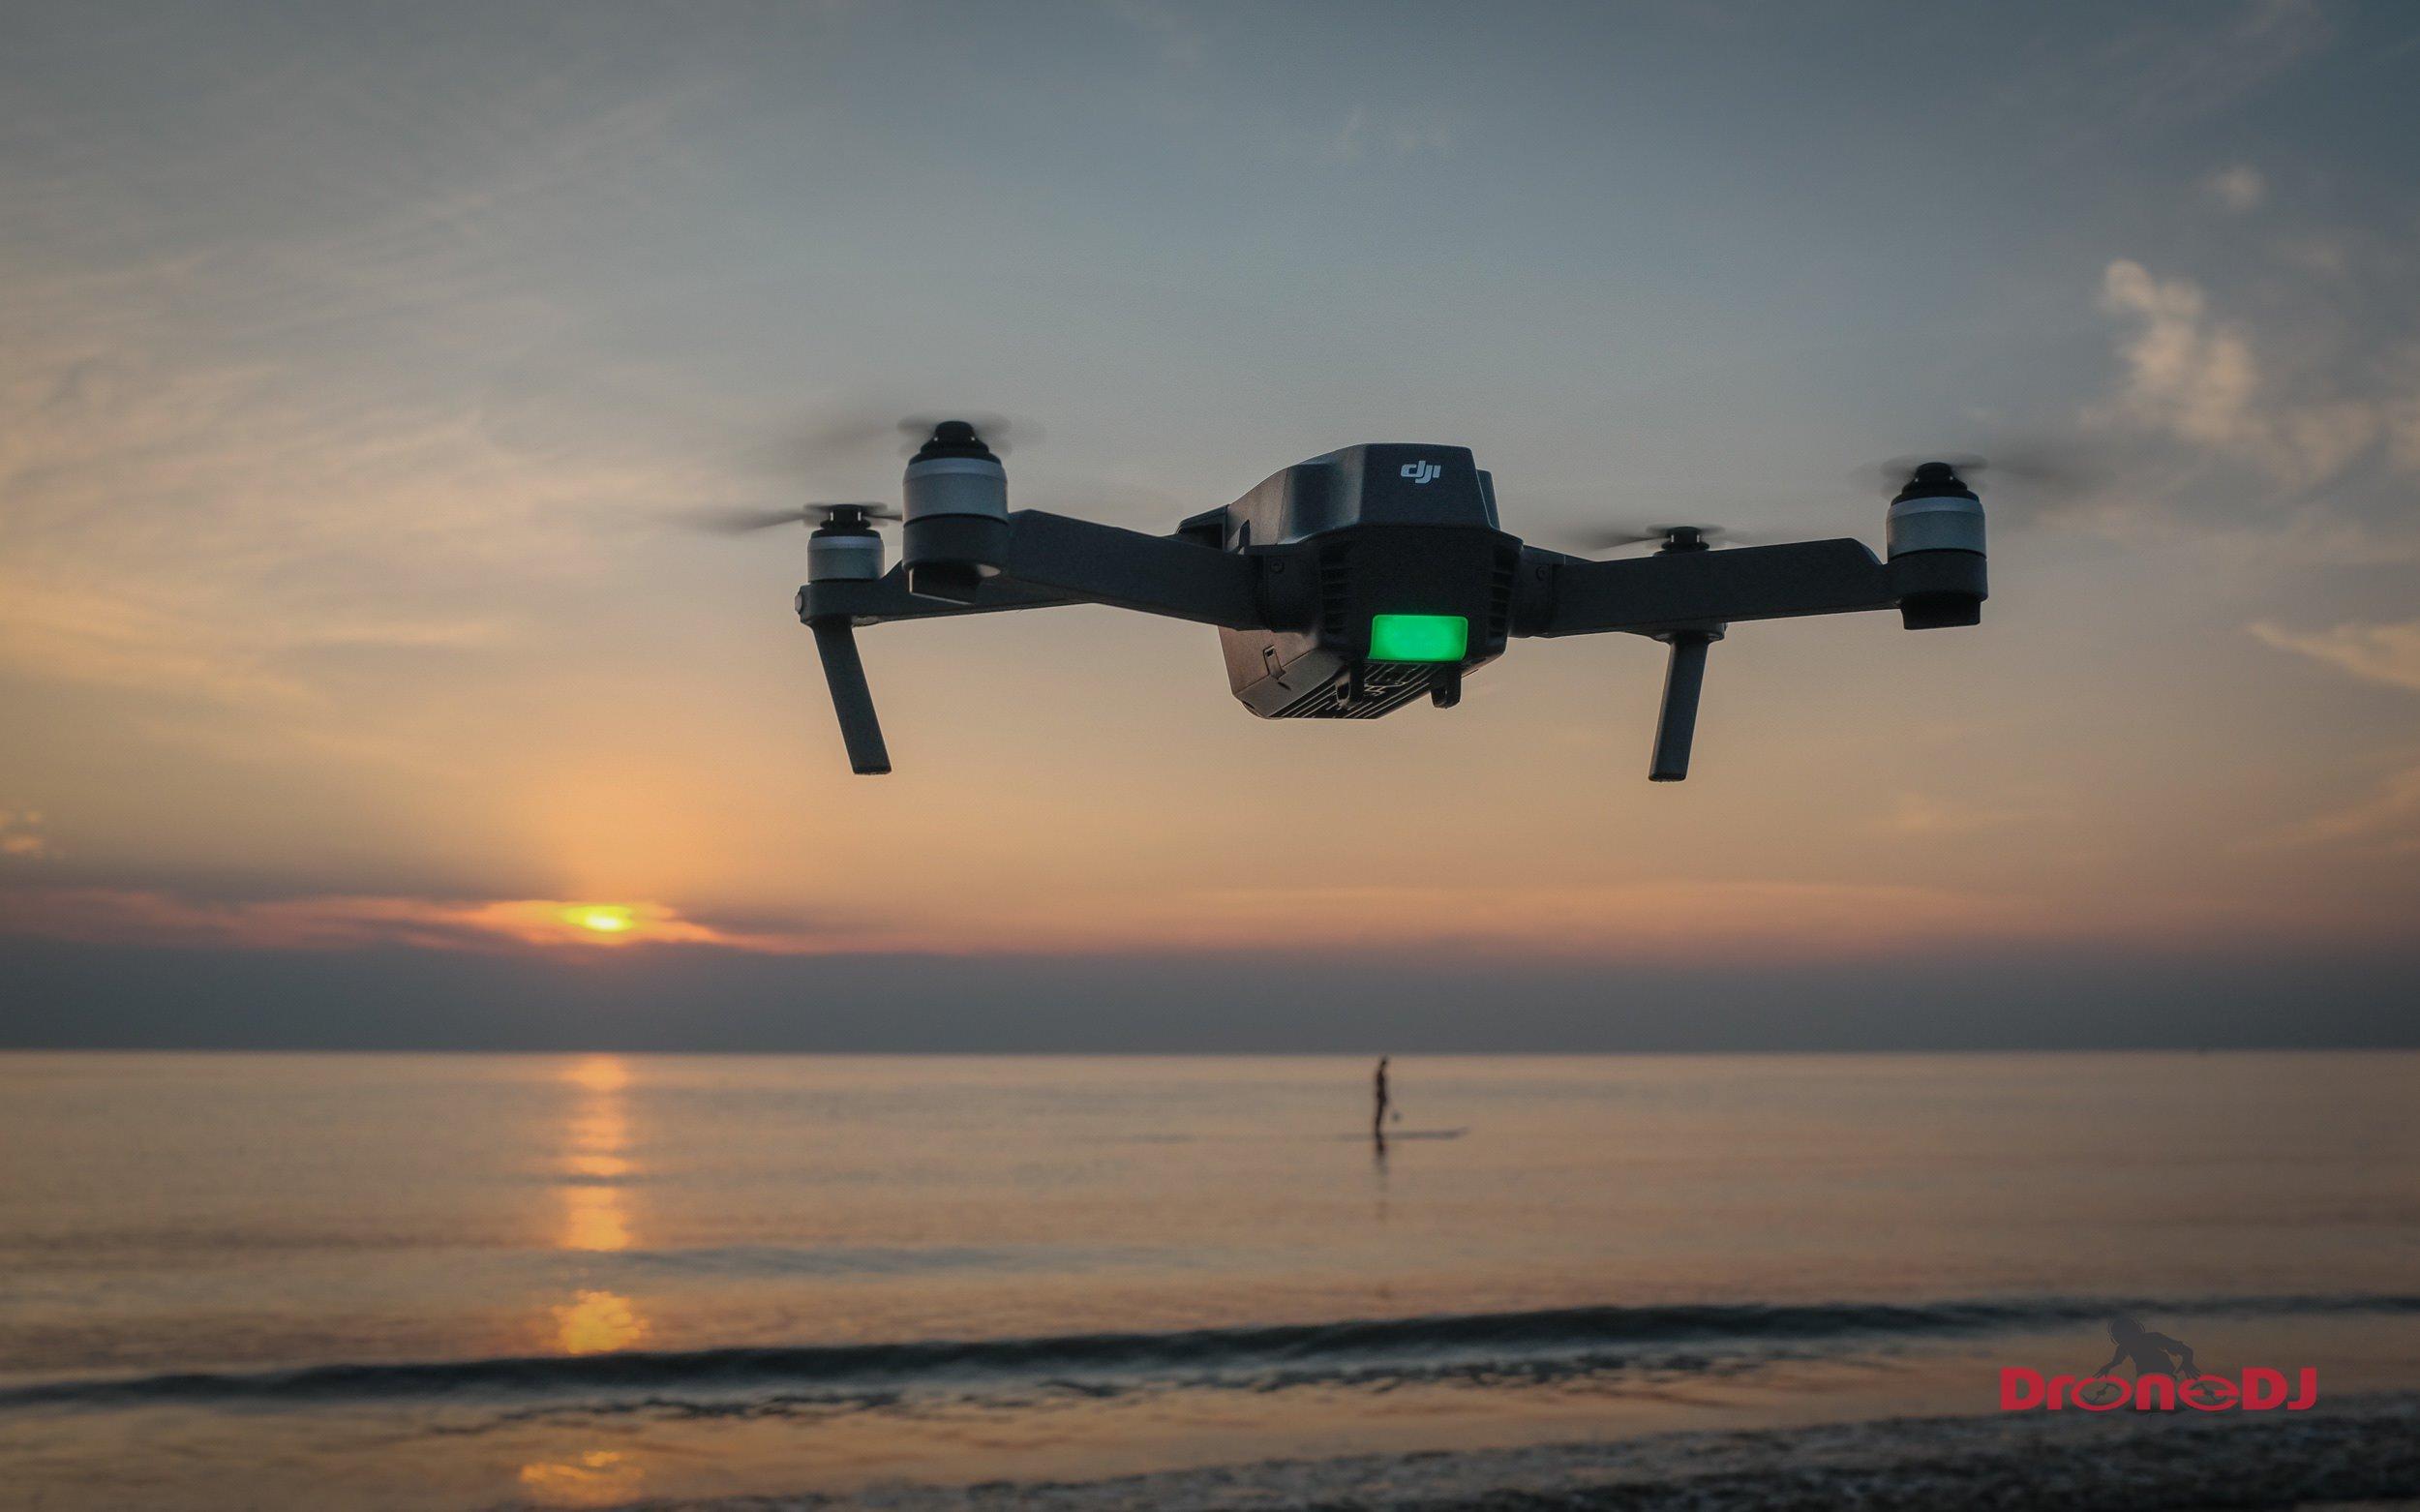 DJI Mavic Pro sets off into the sunset